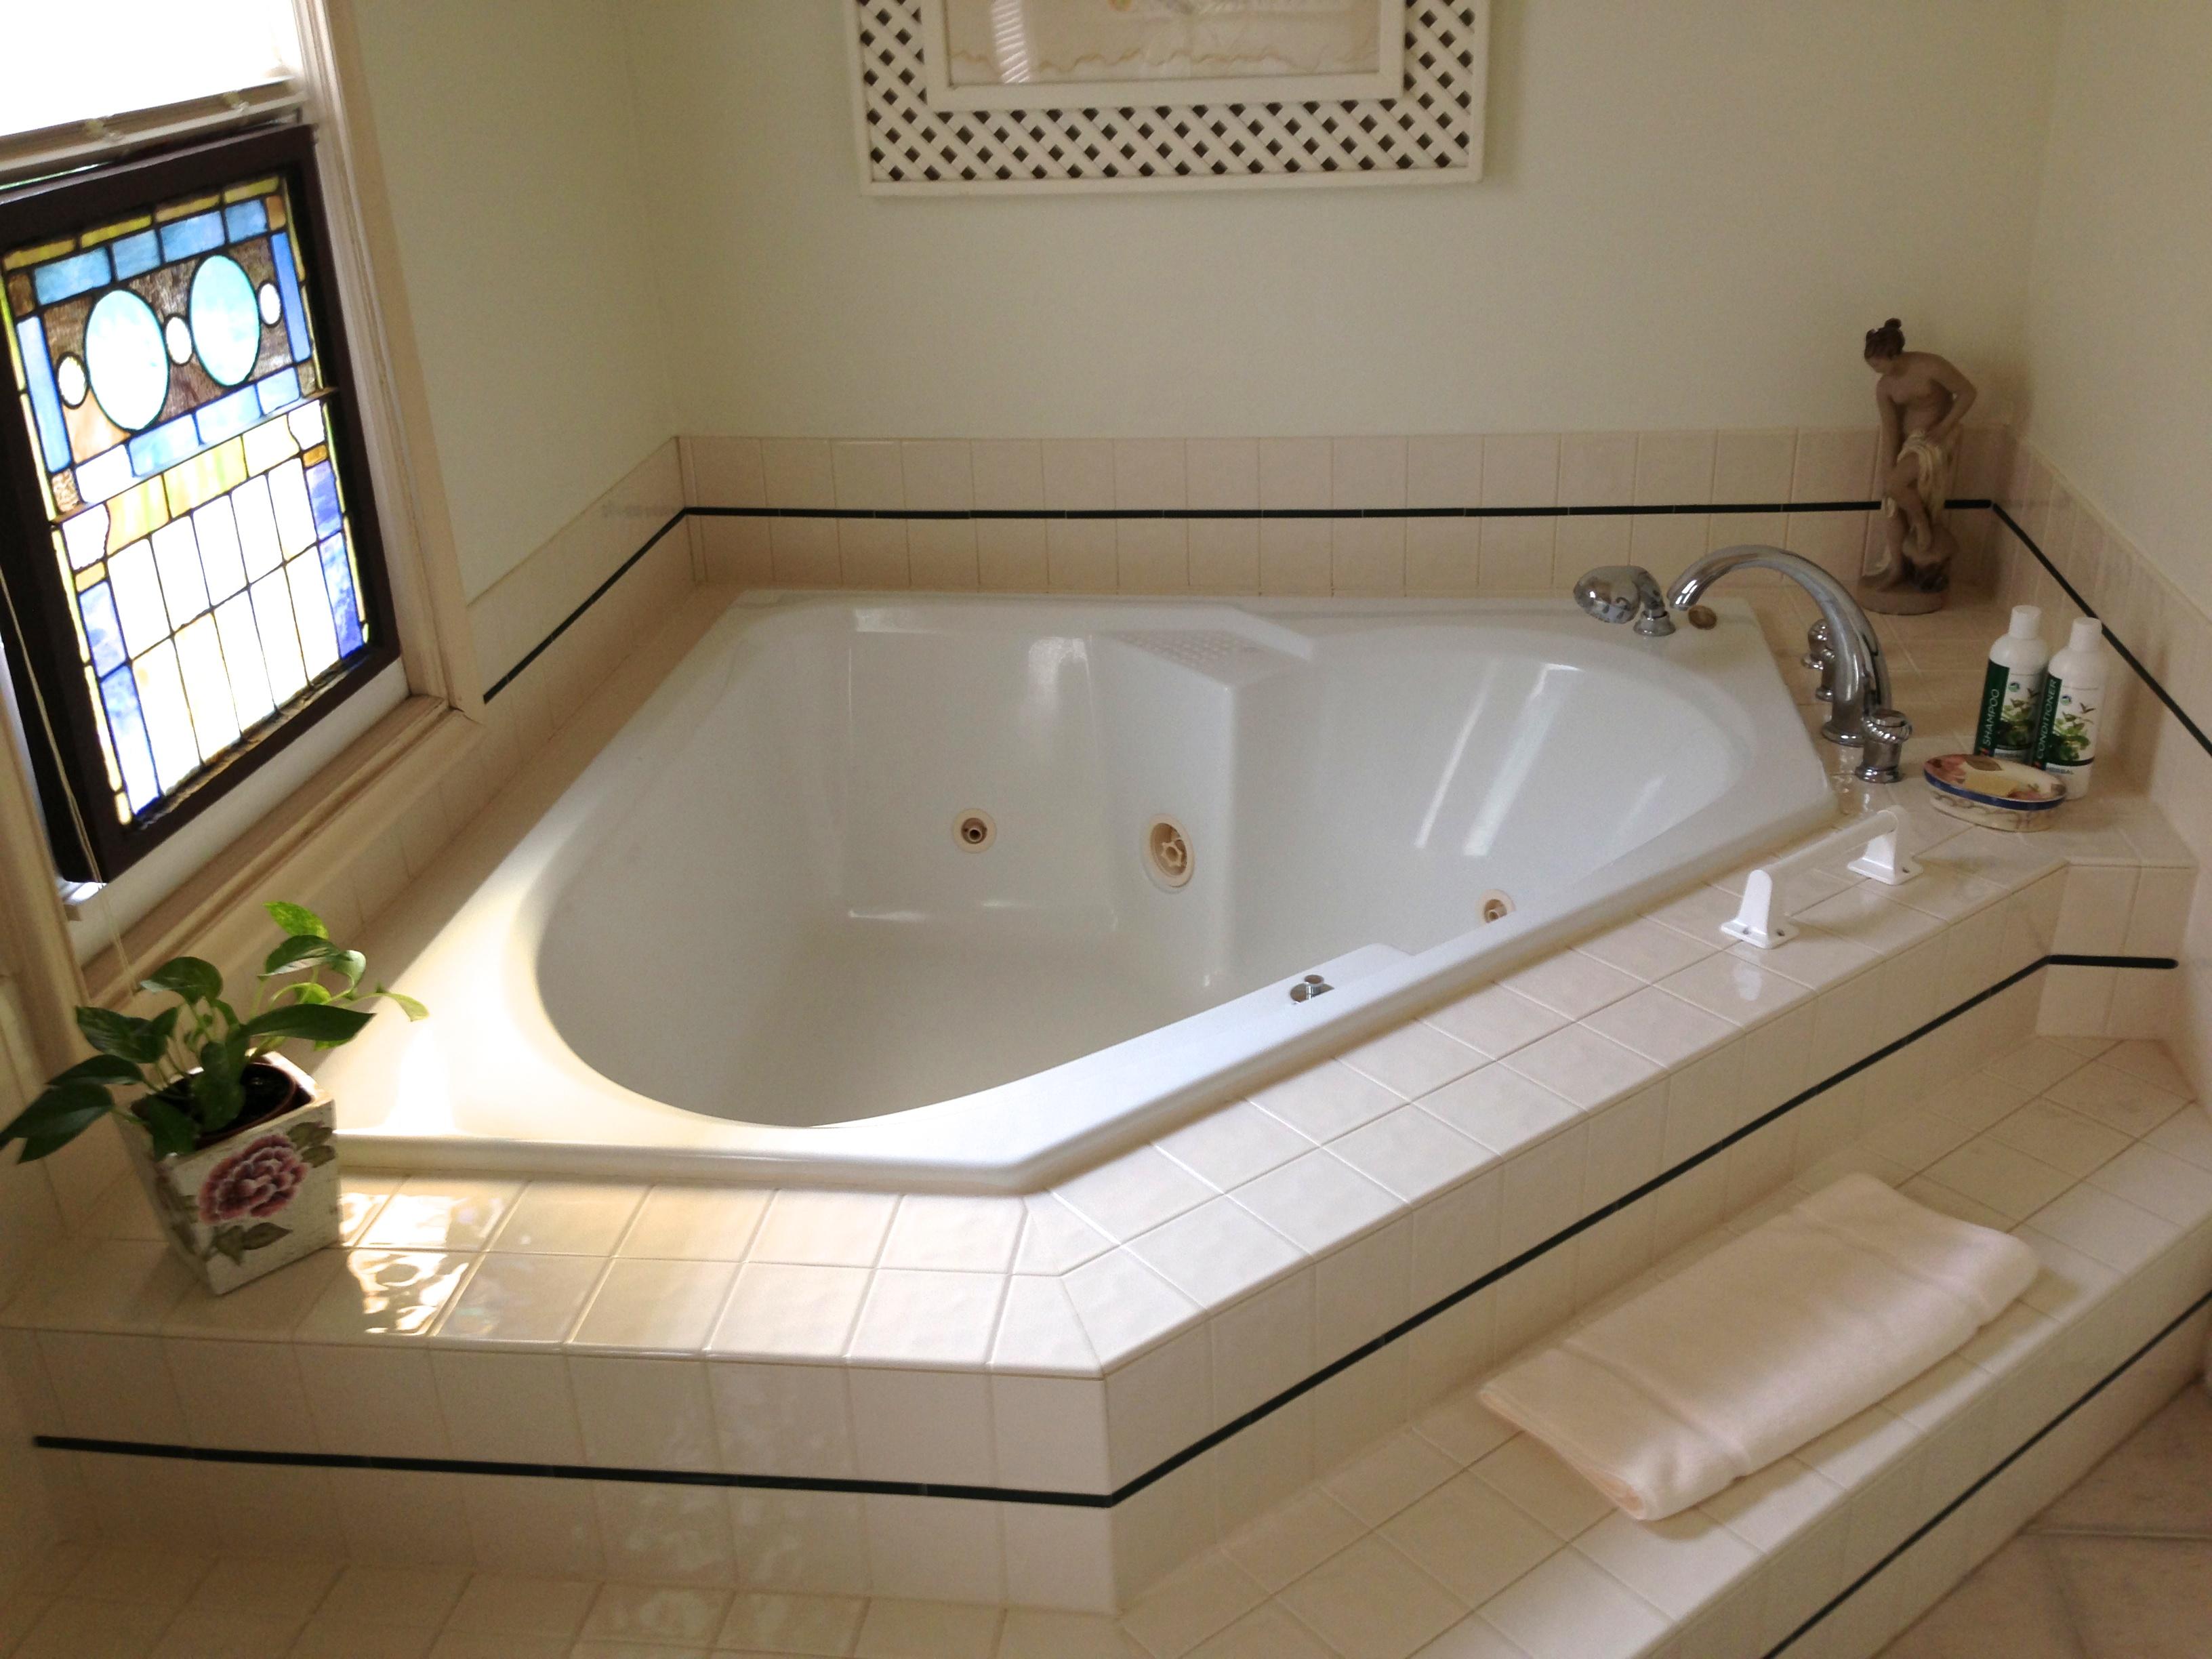 Free Images : floor, swimming pool, property, room, bathtub ...